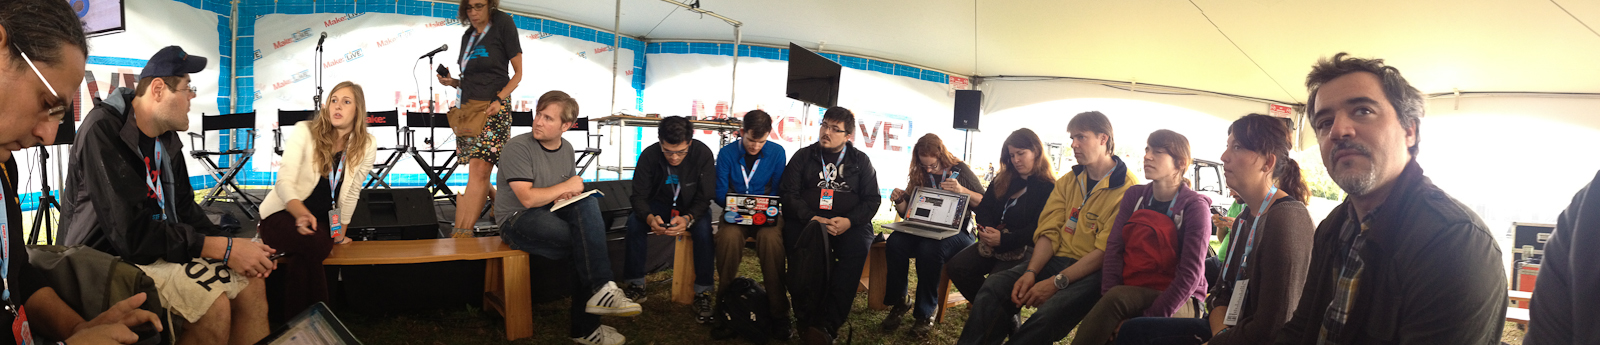 Mini Maker Faire Action:  Fort Wayne, Salt Lake City, Atlanta, Oakland, Ottawa, and Somerville